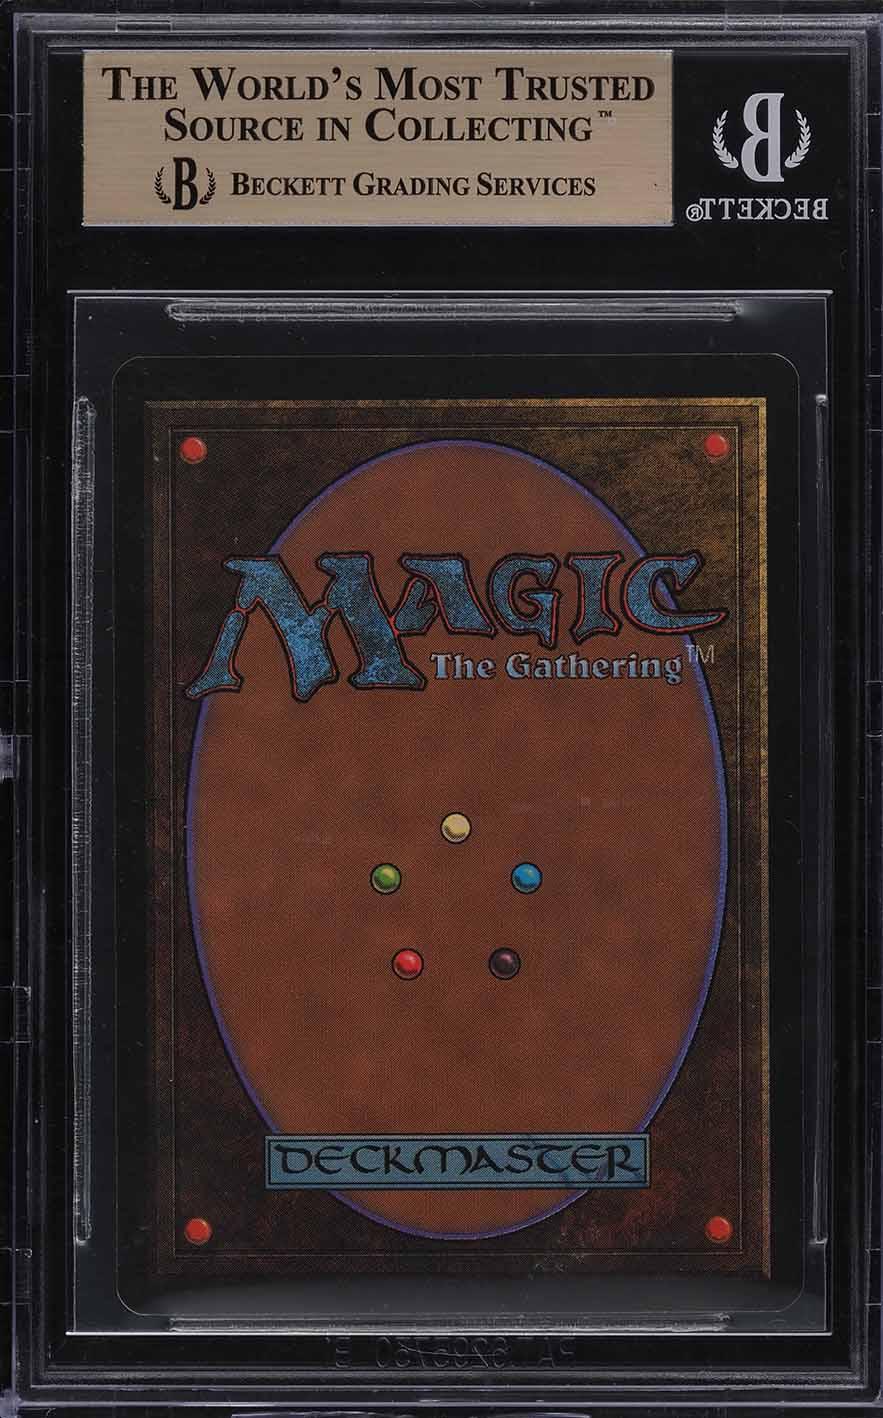 1993 Magic The Gathering MTG Beta Dual Land Underground Sea R L BGS 9.5 (PWCC) - Image 2